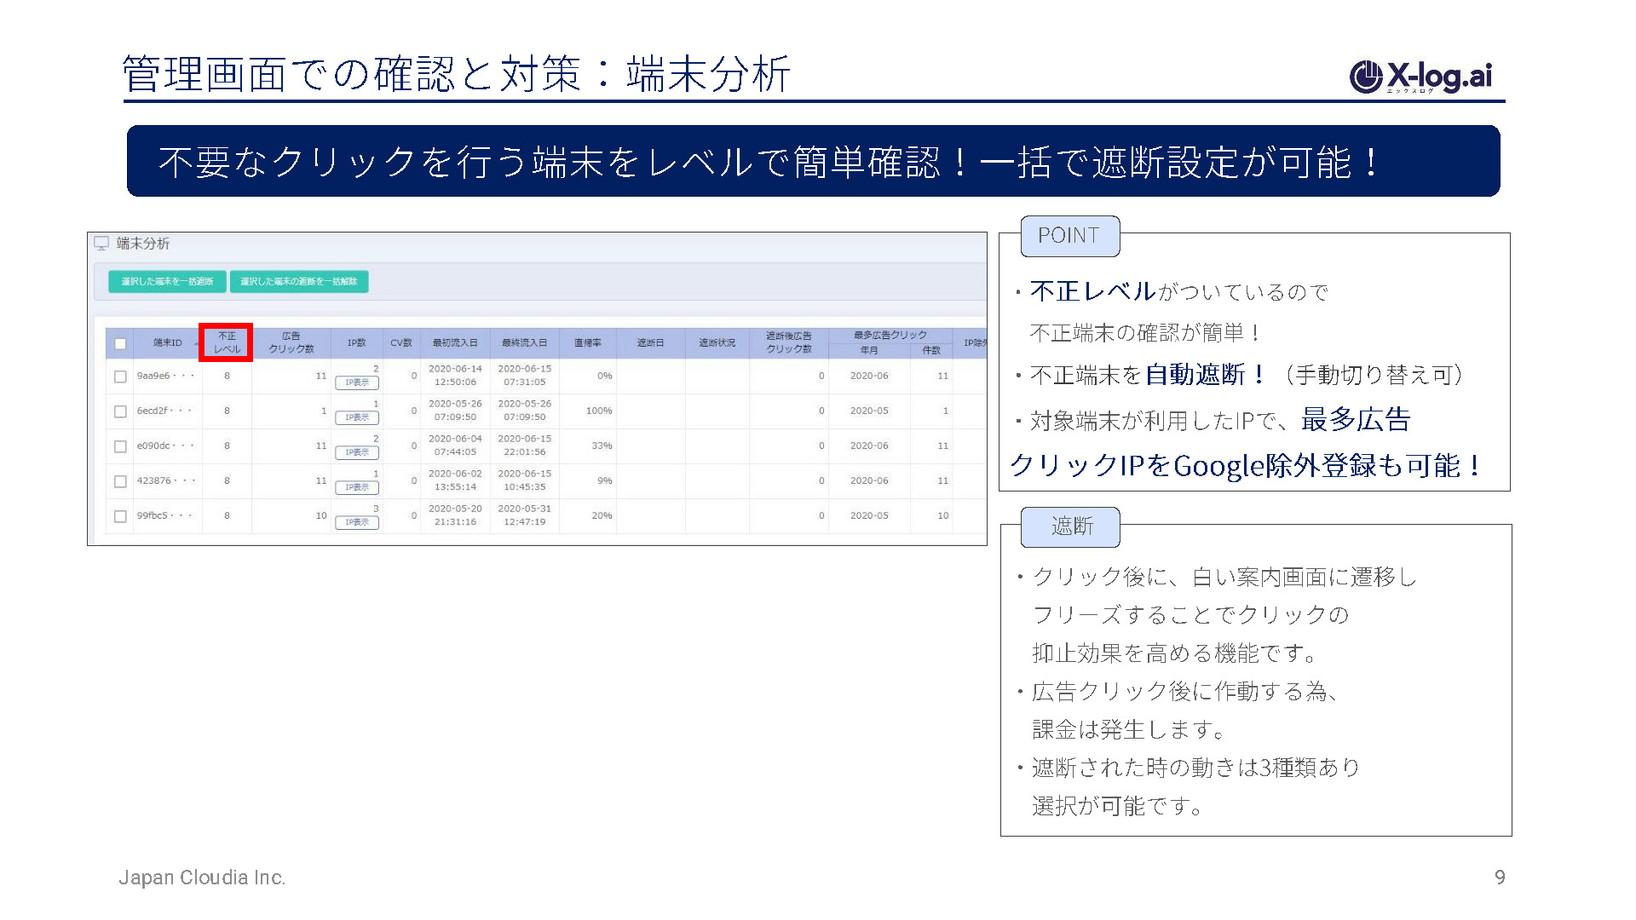 X-log.aiご案内資料_ページ_09.jpg